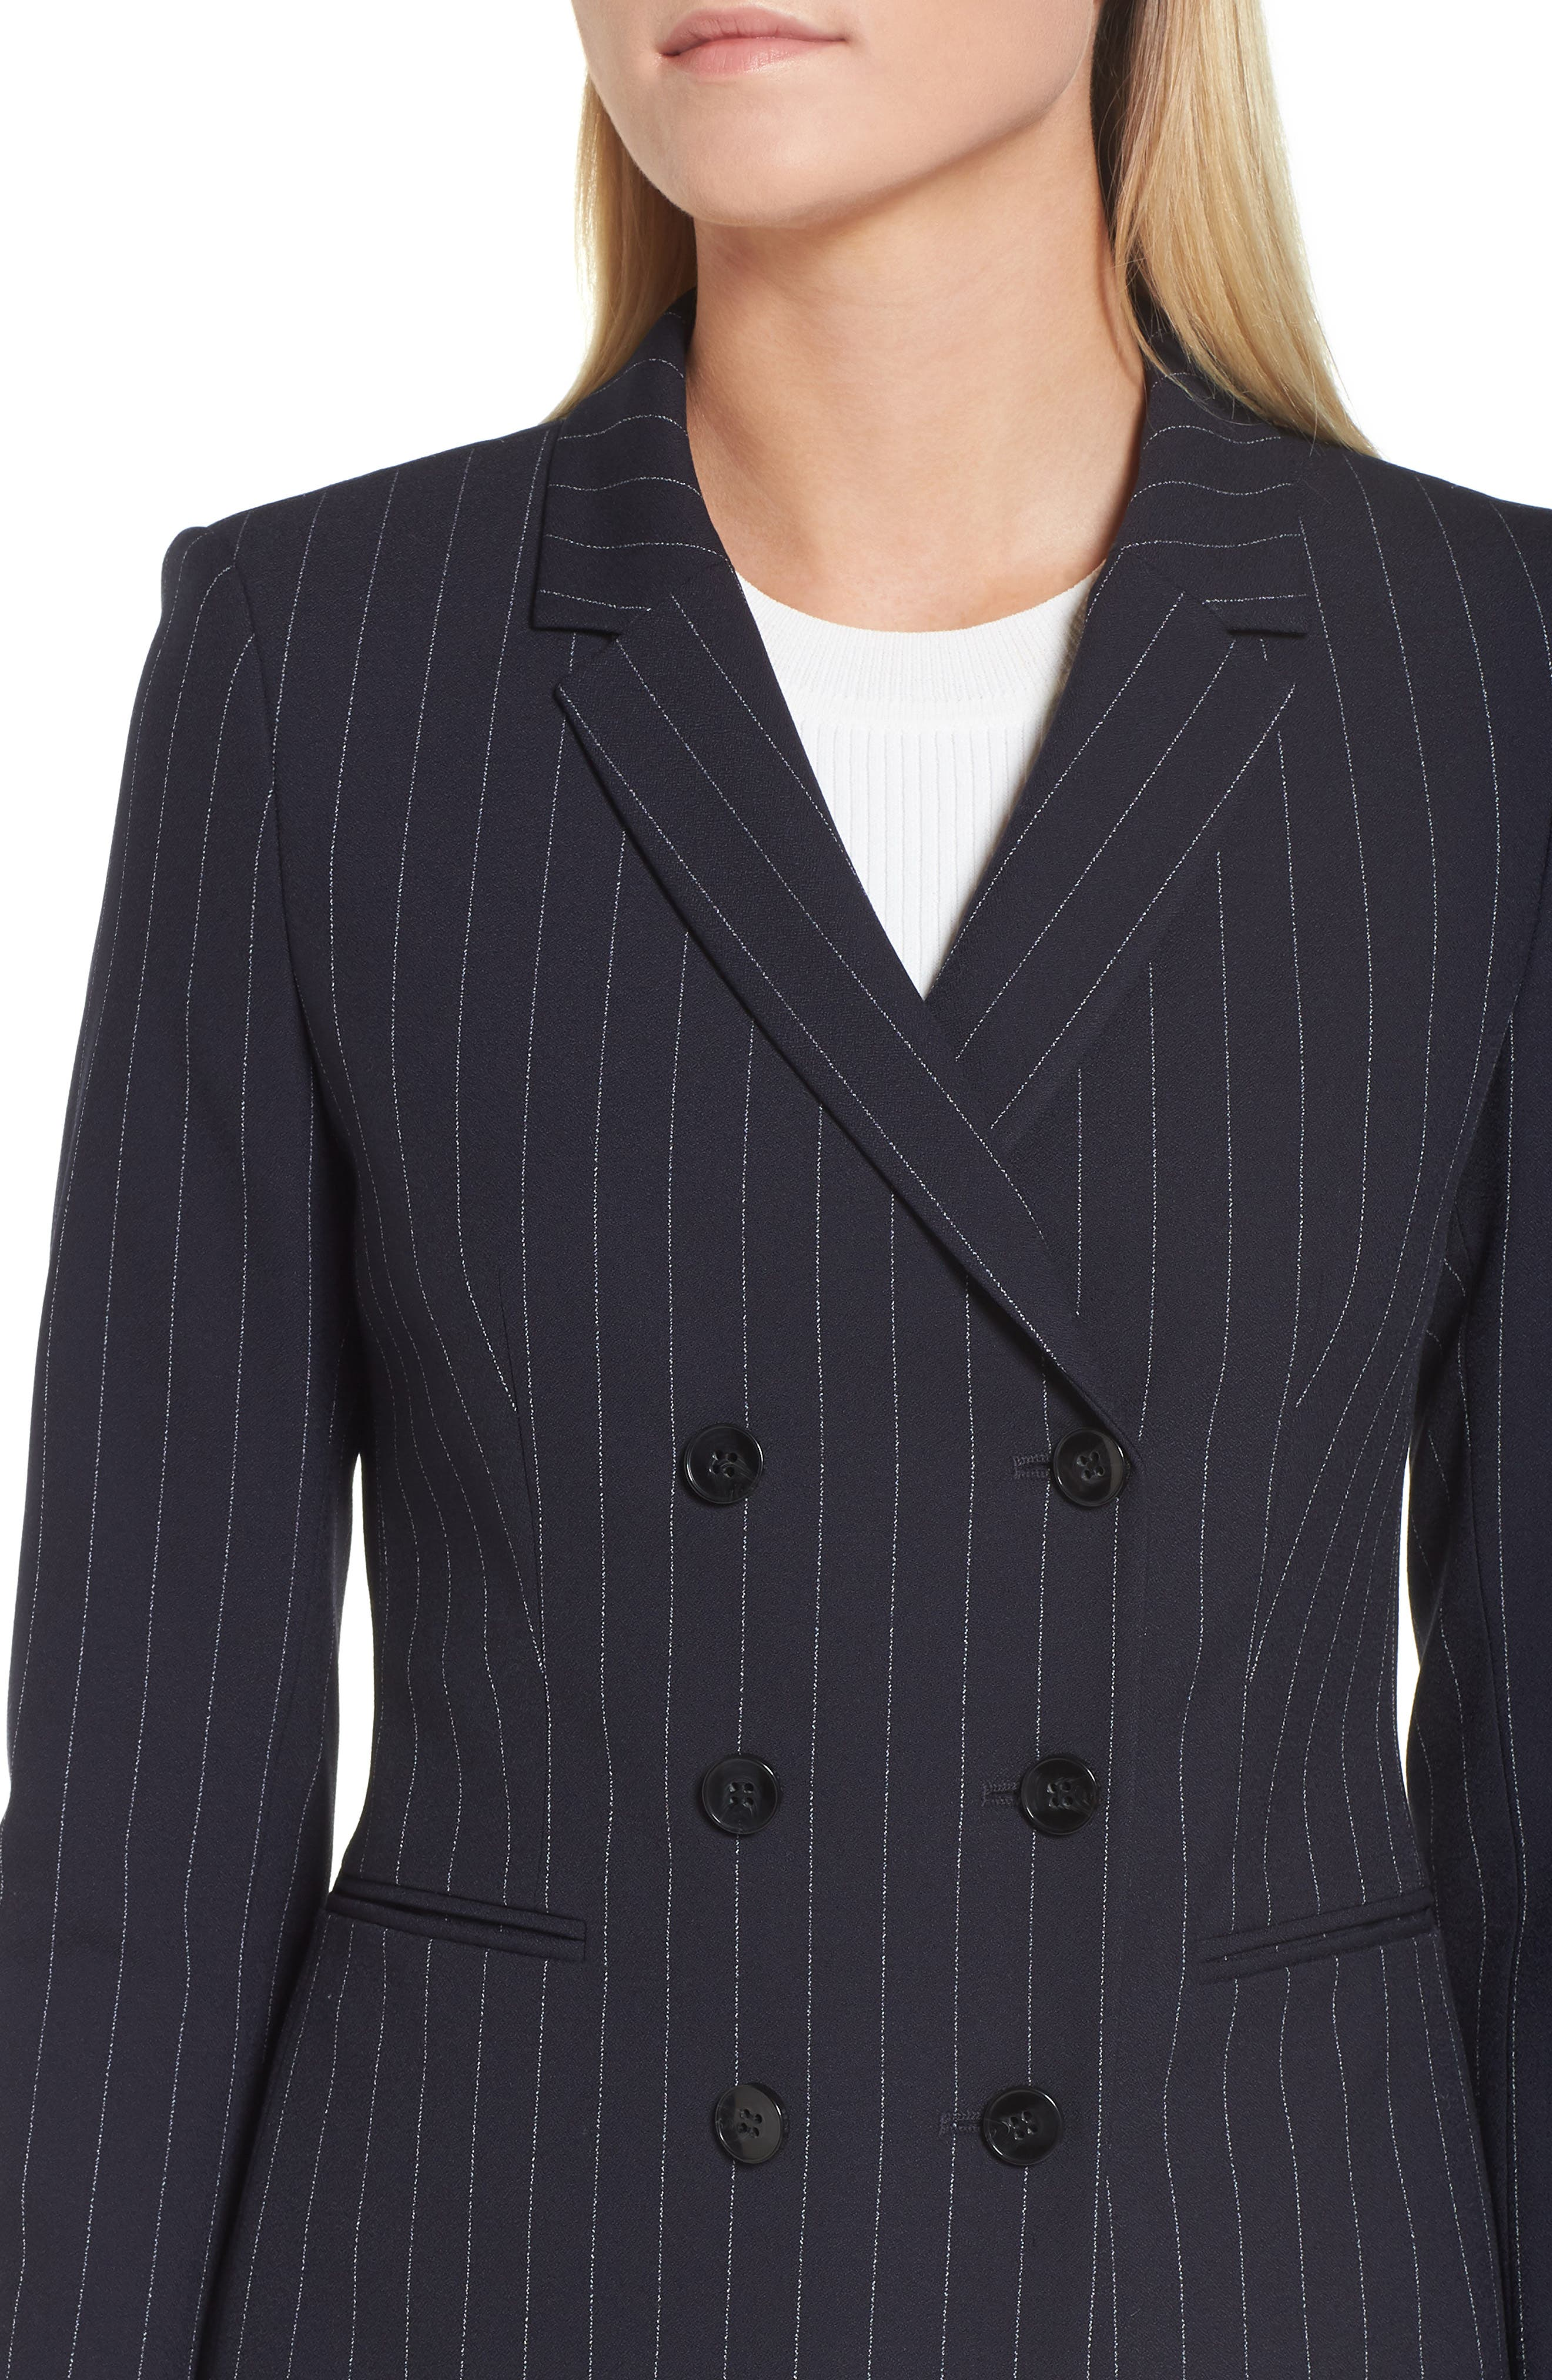 Jelaya Double Breasted Suit Jacket,                             Alternate thumbnail 4, color,                             Navy Fantasy